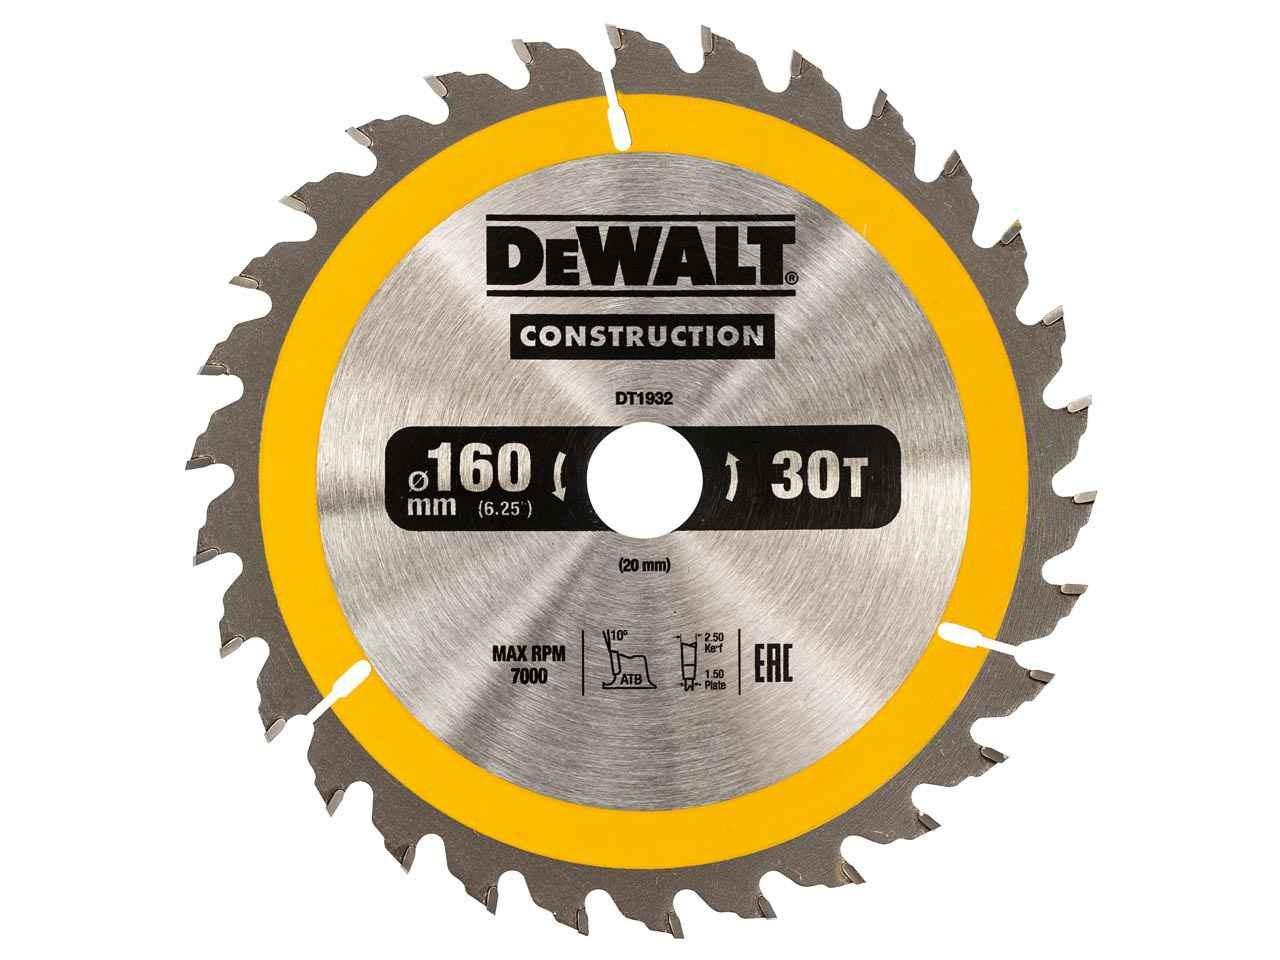 Dewalt dt1932qz construction circular saw blade 160x20mm 30t ac greentooth Images